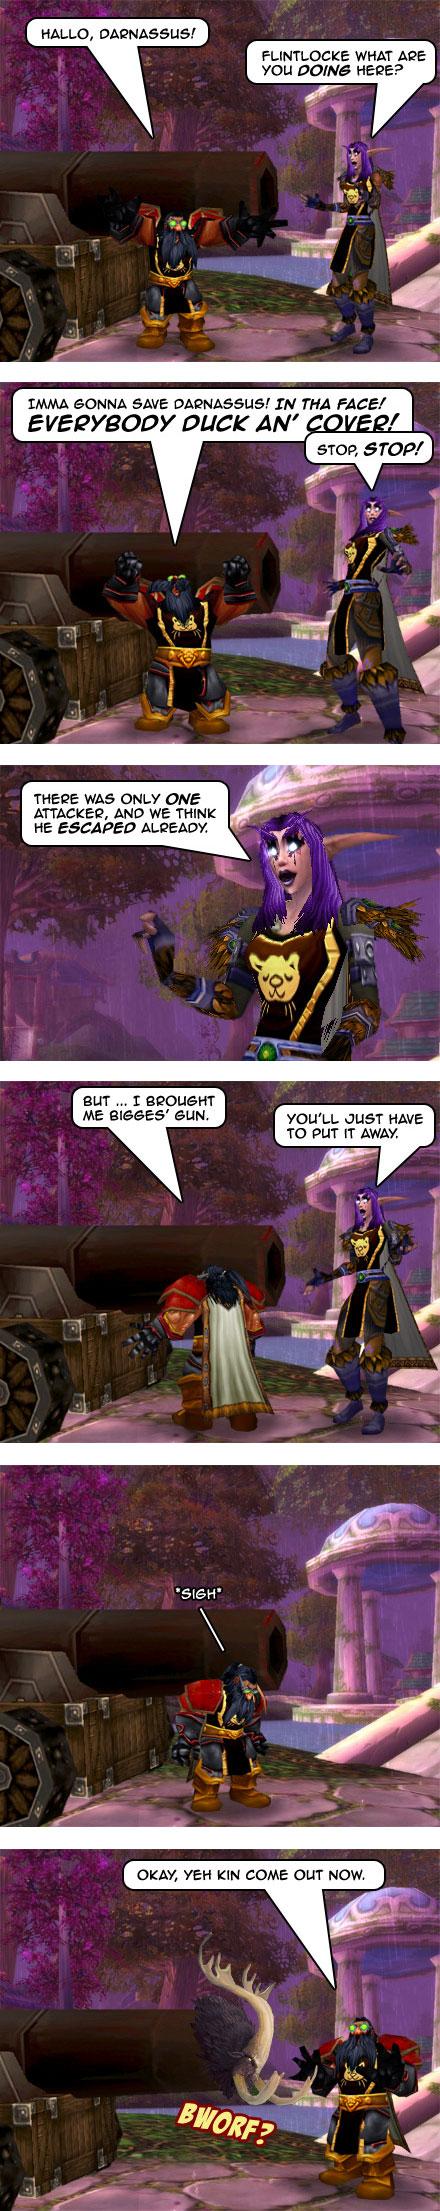 Part 4: Woe to Darnassus